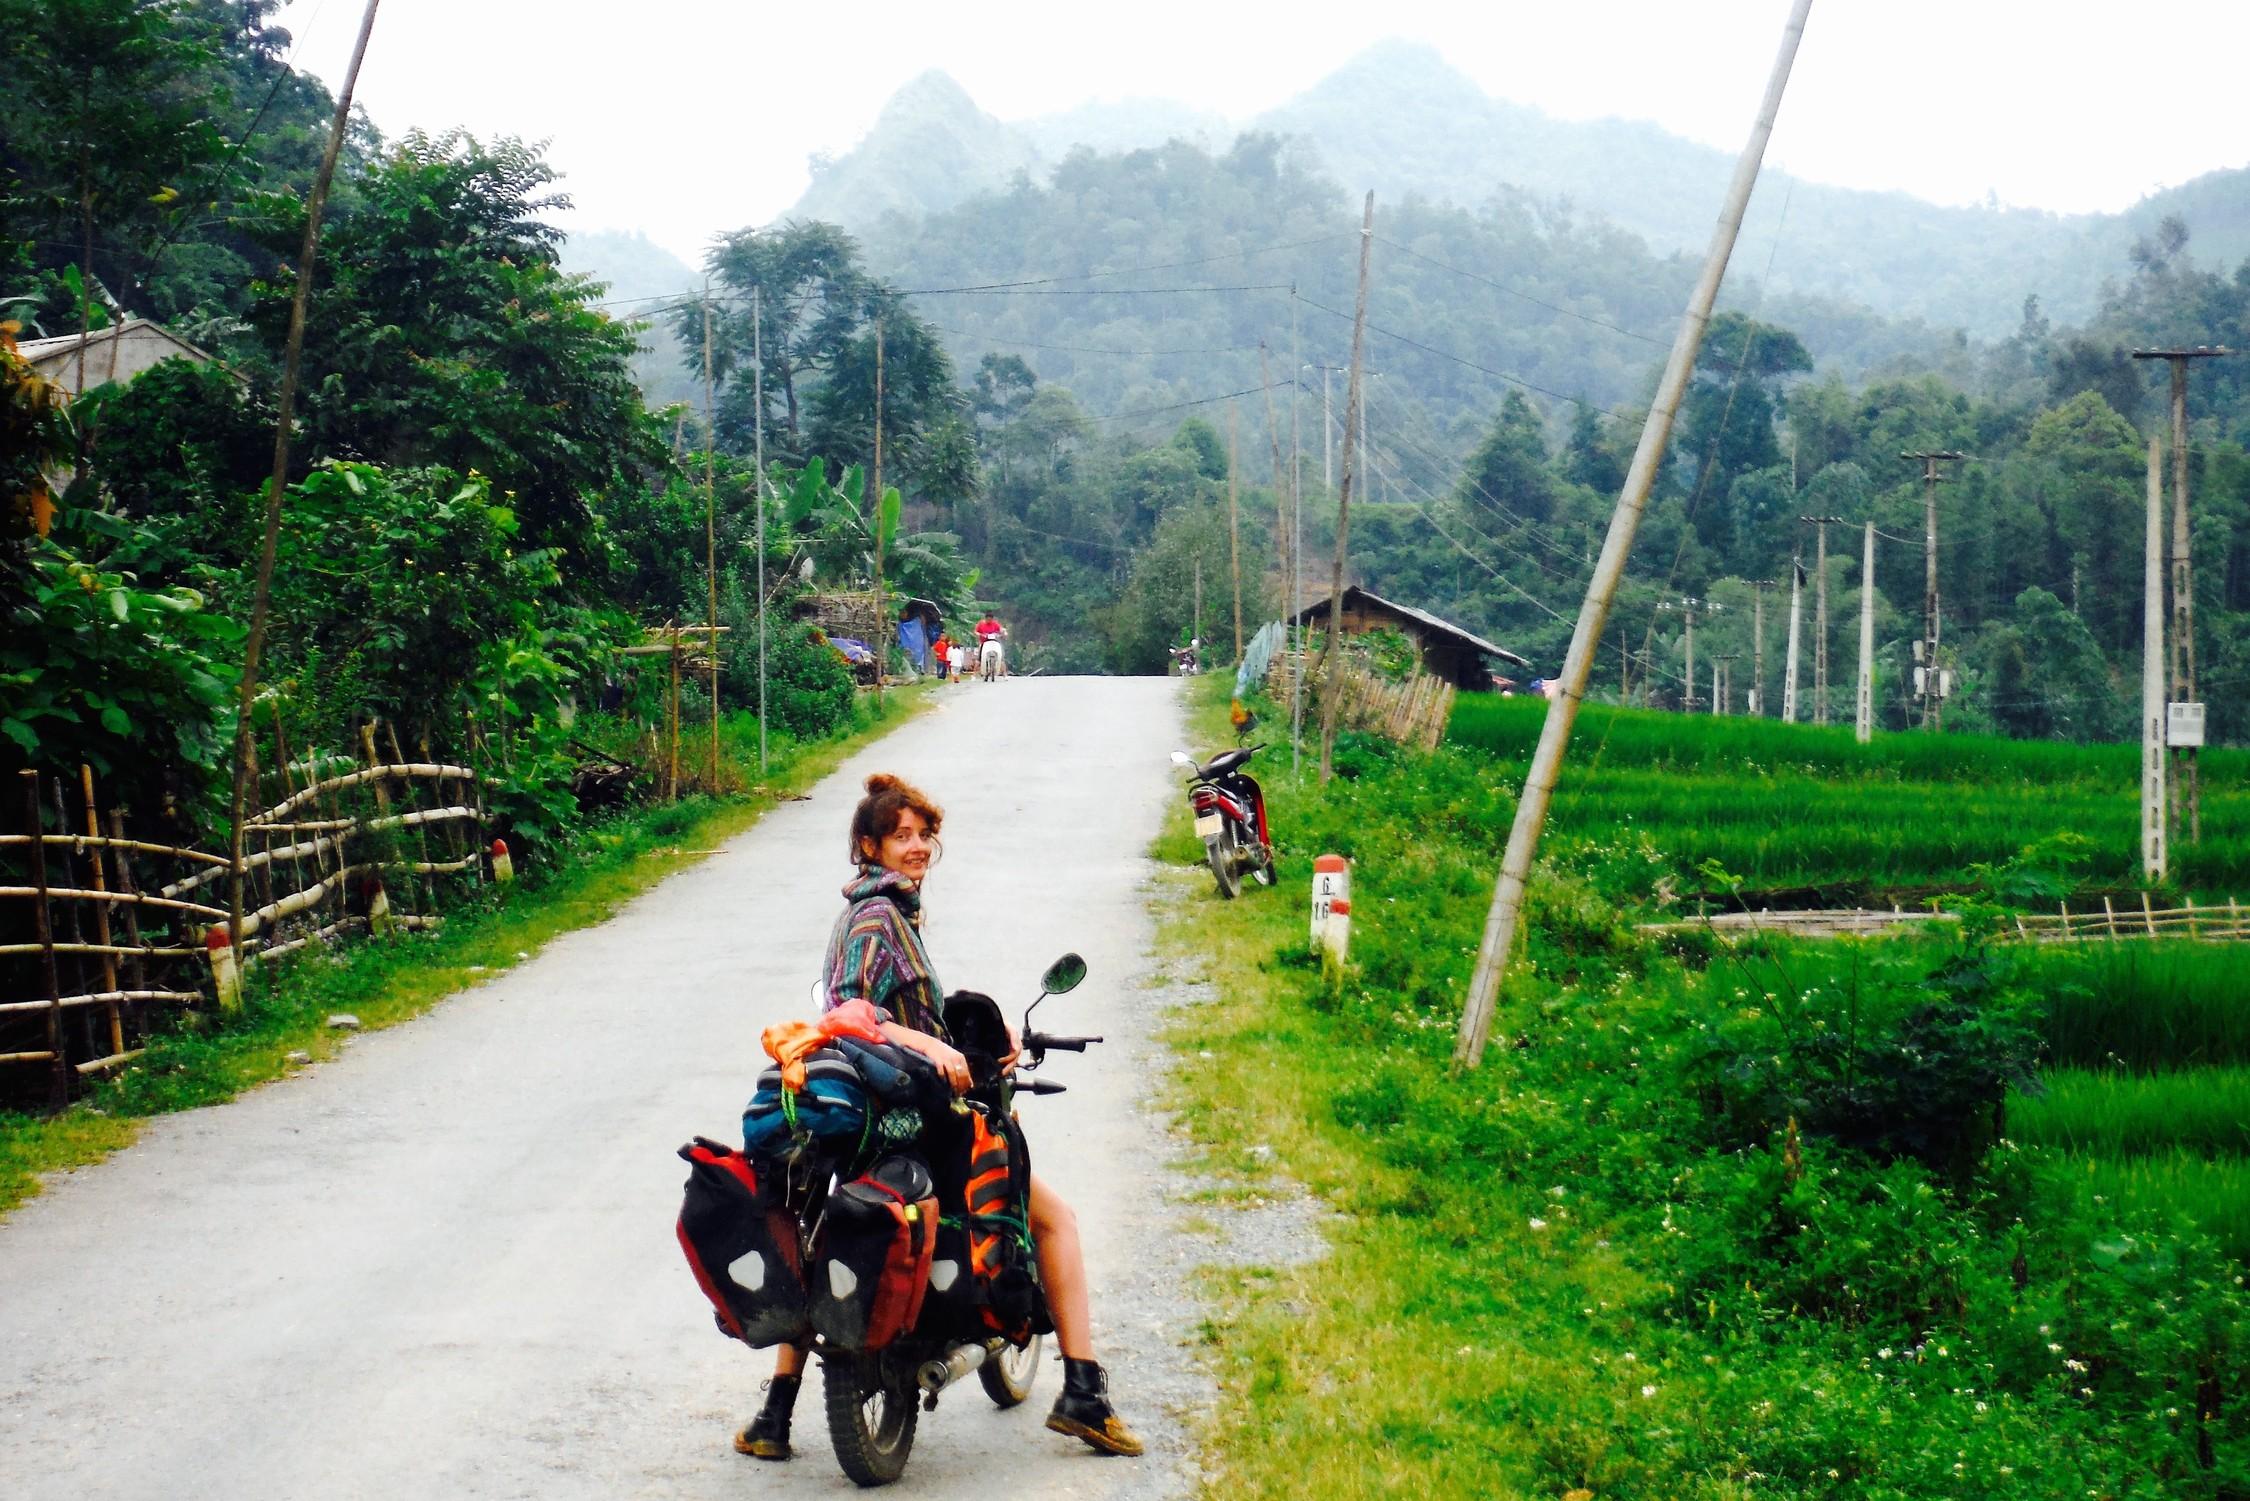 rsz_donna_haute_culture_travel_blog_motorbike_north_vietnam_-_edited